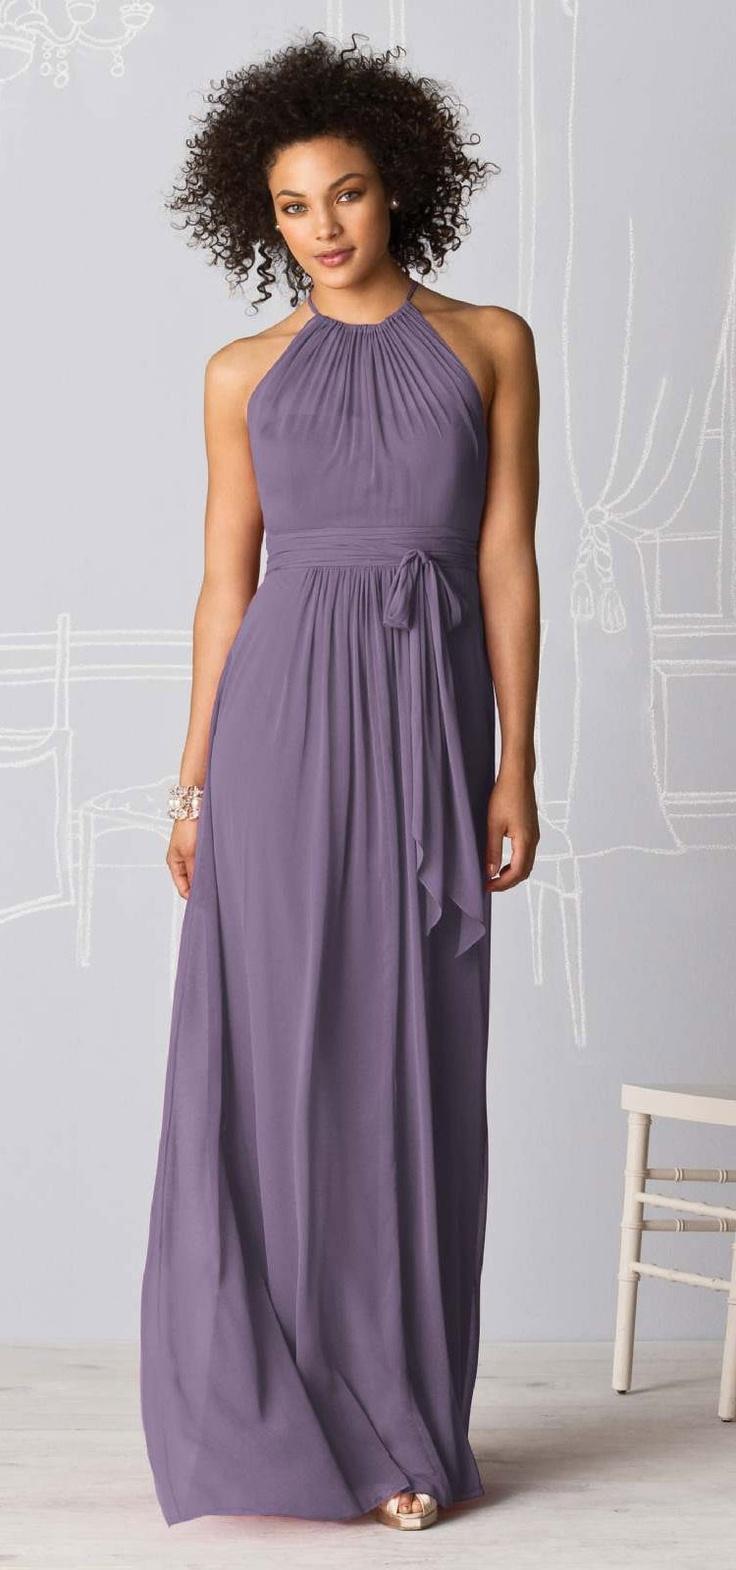 15 best bridesmaid images on Pinterest | Party wear dresses, Bridal ...